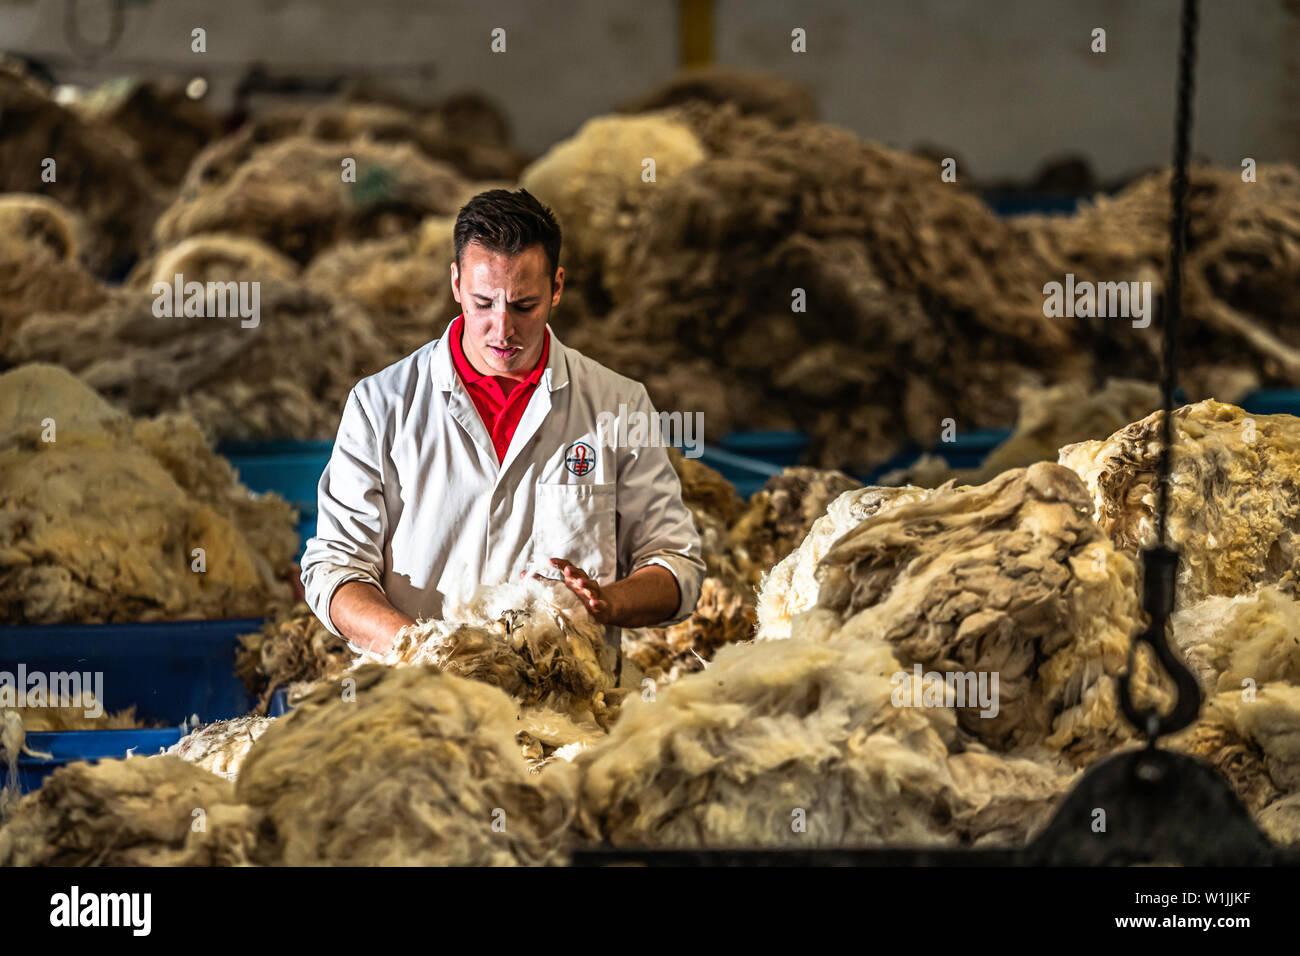 Galashiels, Scottish Borders, UK. 25th June 2019. The British Wool grading depot at Galashiels enters it's peak summer season as premium sheep fleeces - Stock Image